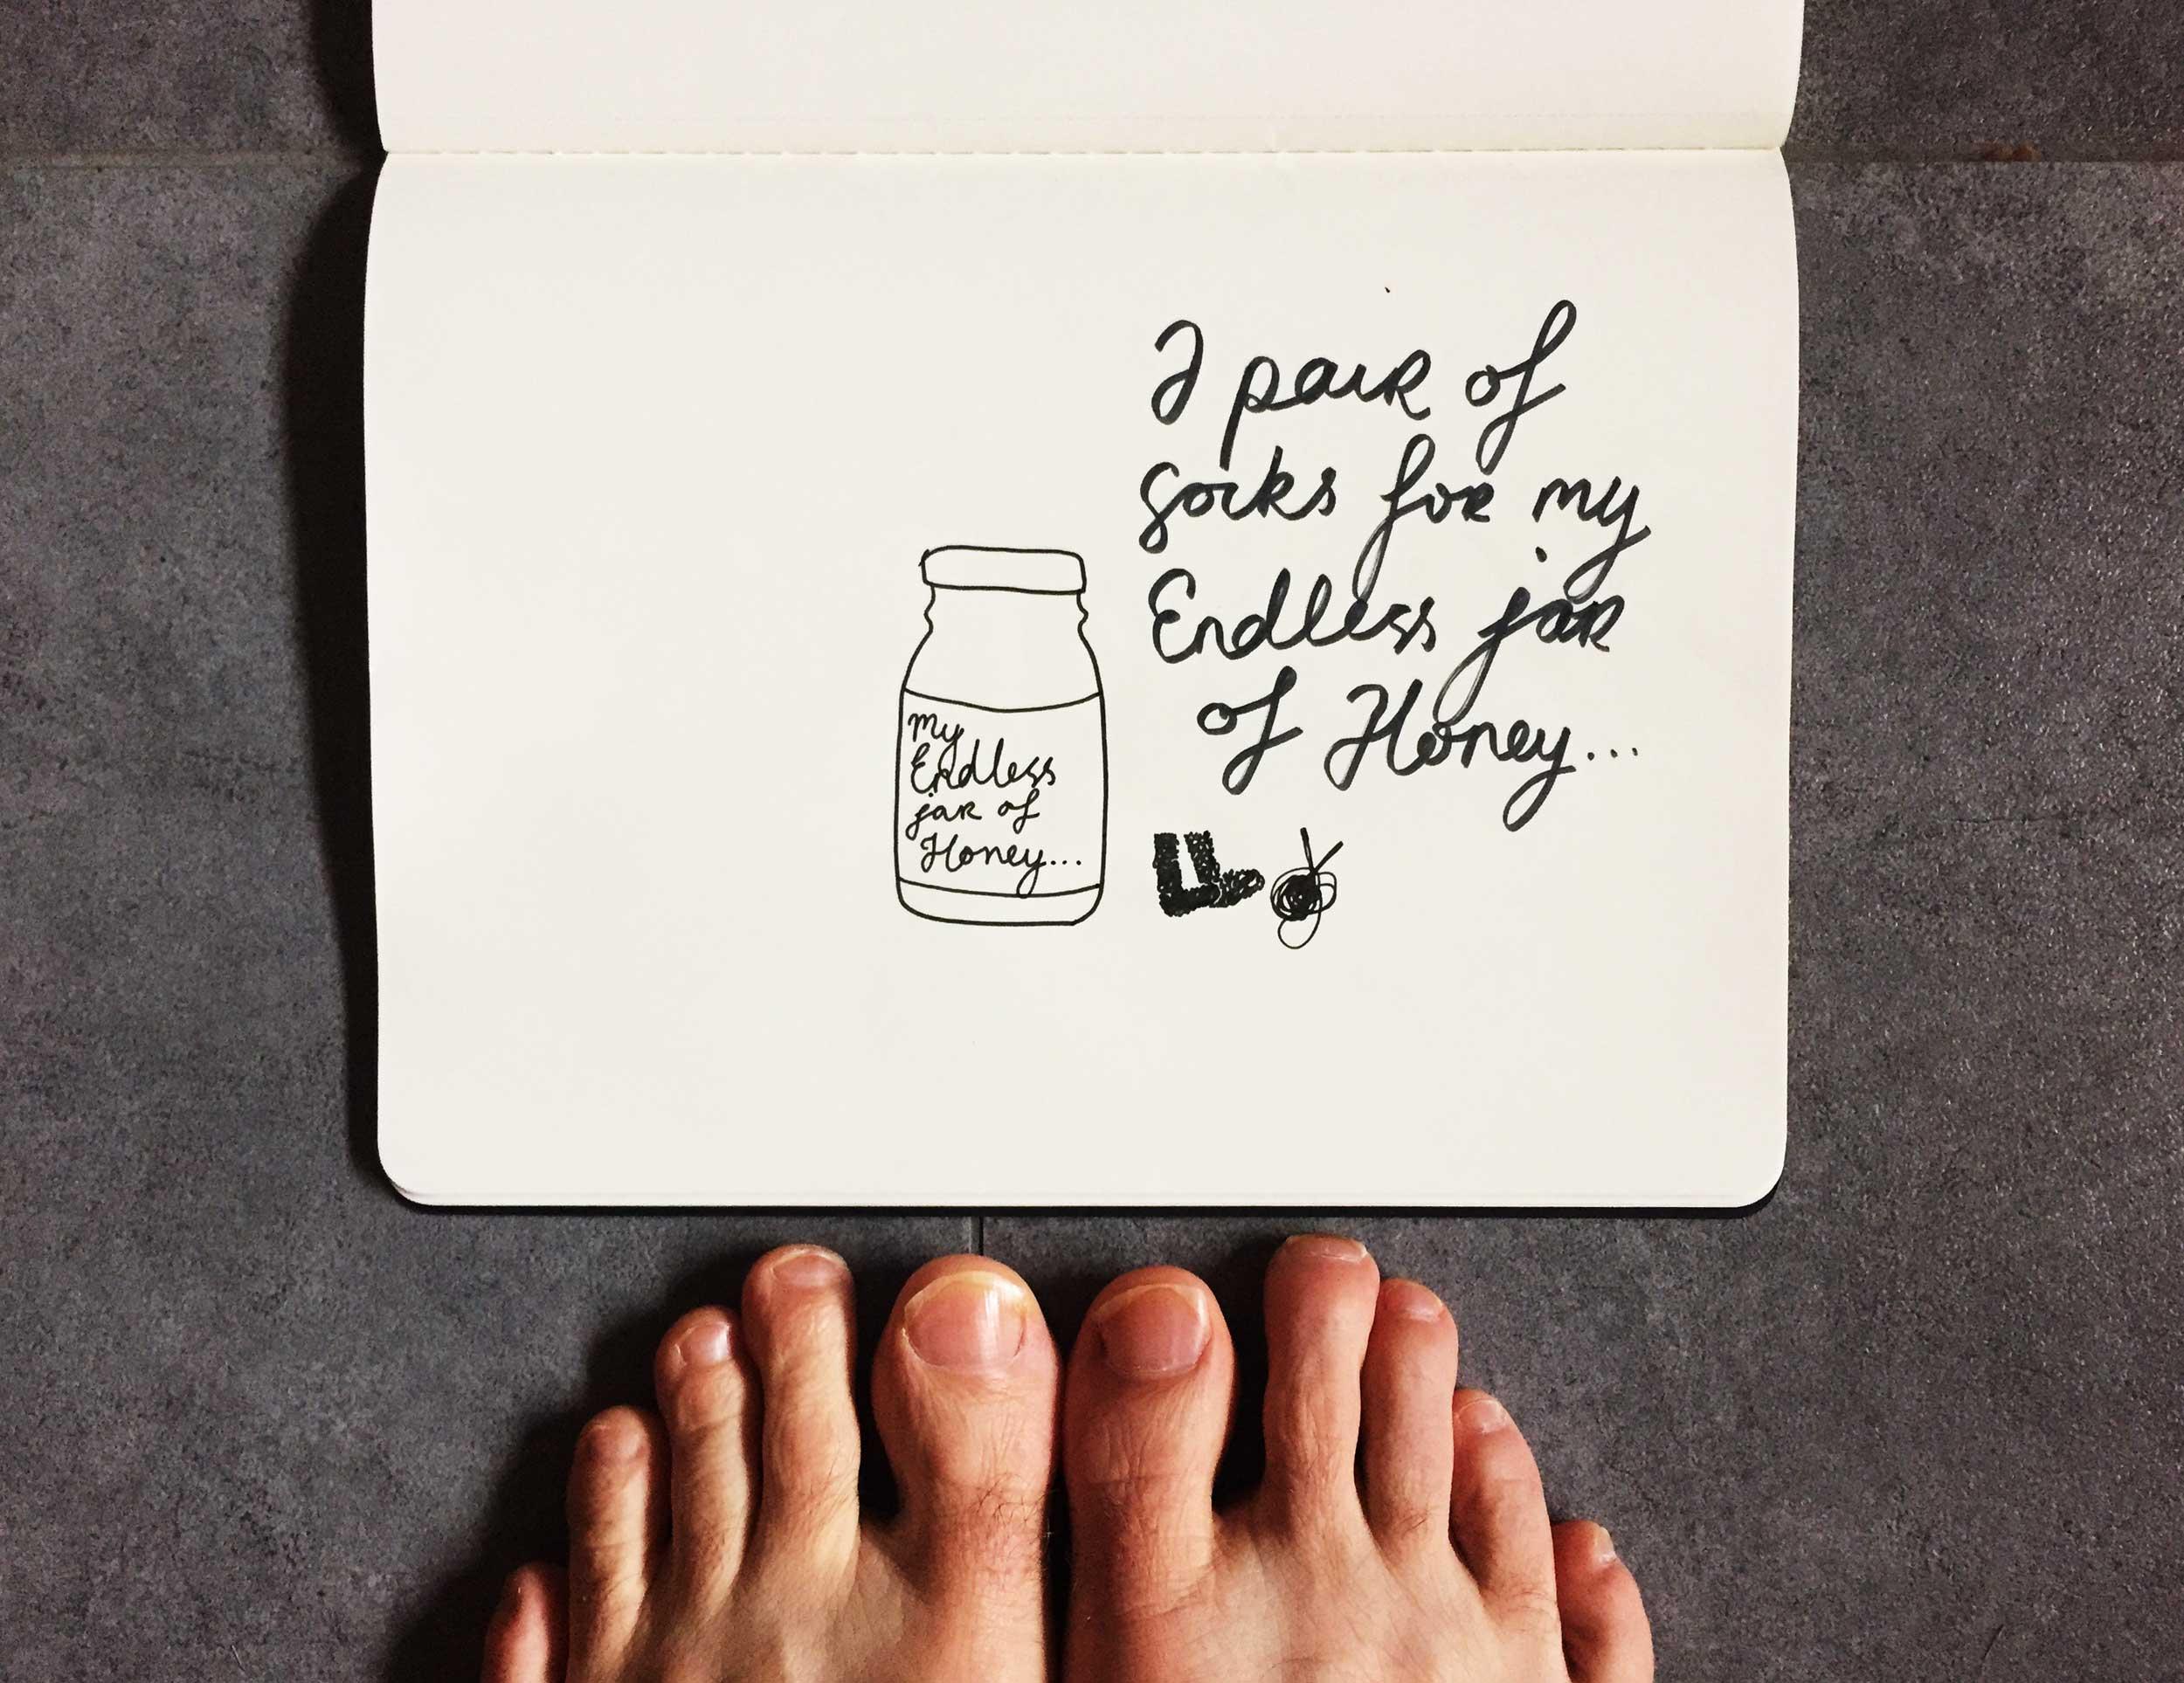 A pair of socks for my Endless Jar of Honey... Drawing Luke Hockley.